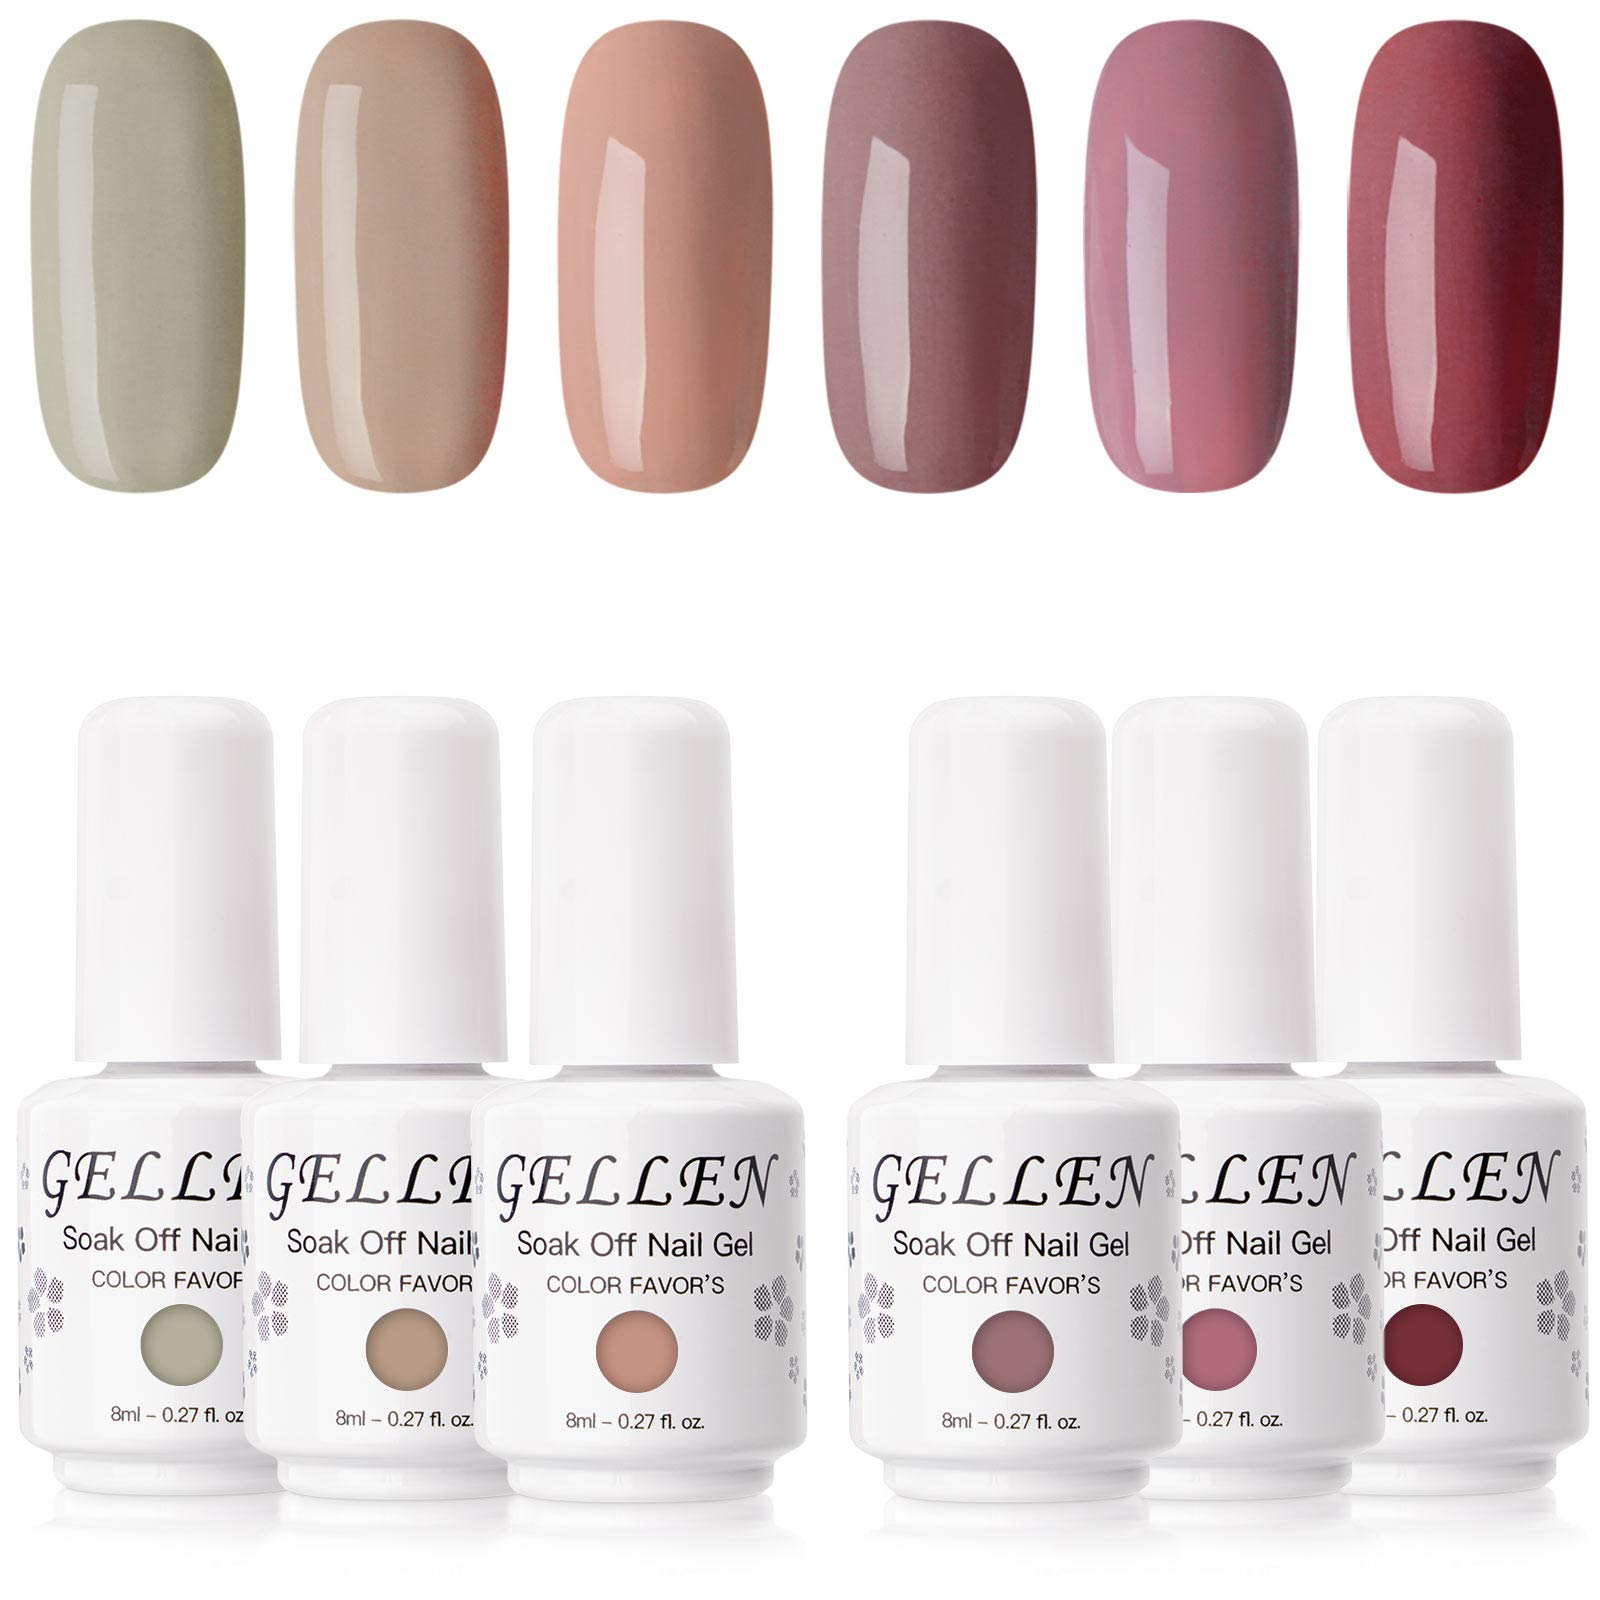 Gellen Gel Nail Polish Kit- Popular Nudes Palette Pastel Neutral 6 Colors, Trendy Warm Earthy Tones Nail Art Gel Polish Home Gel Manicure Set